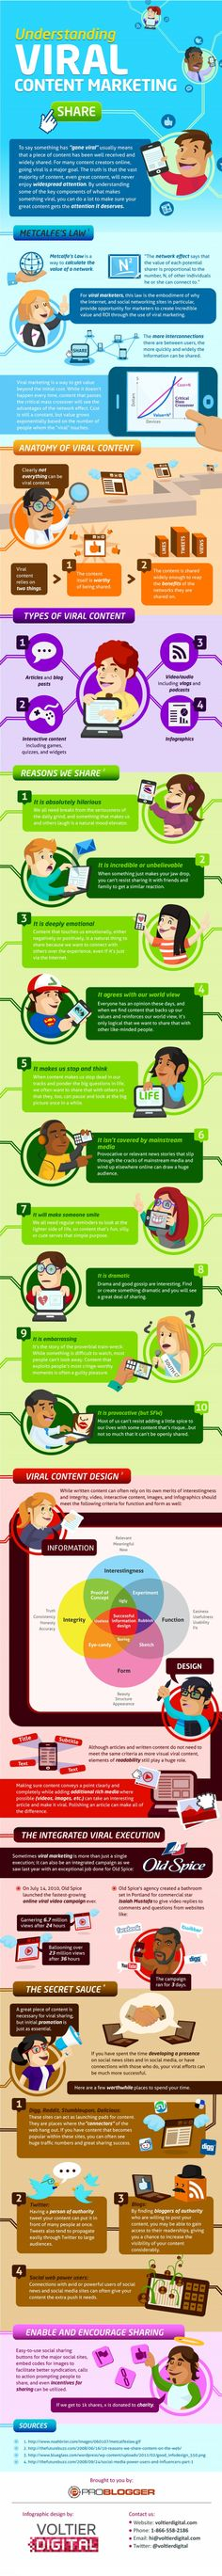 Understanding Viral Content Marketing